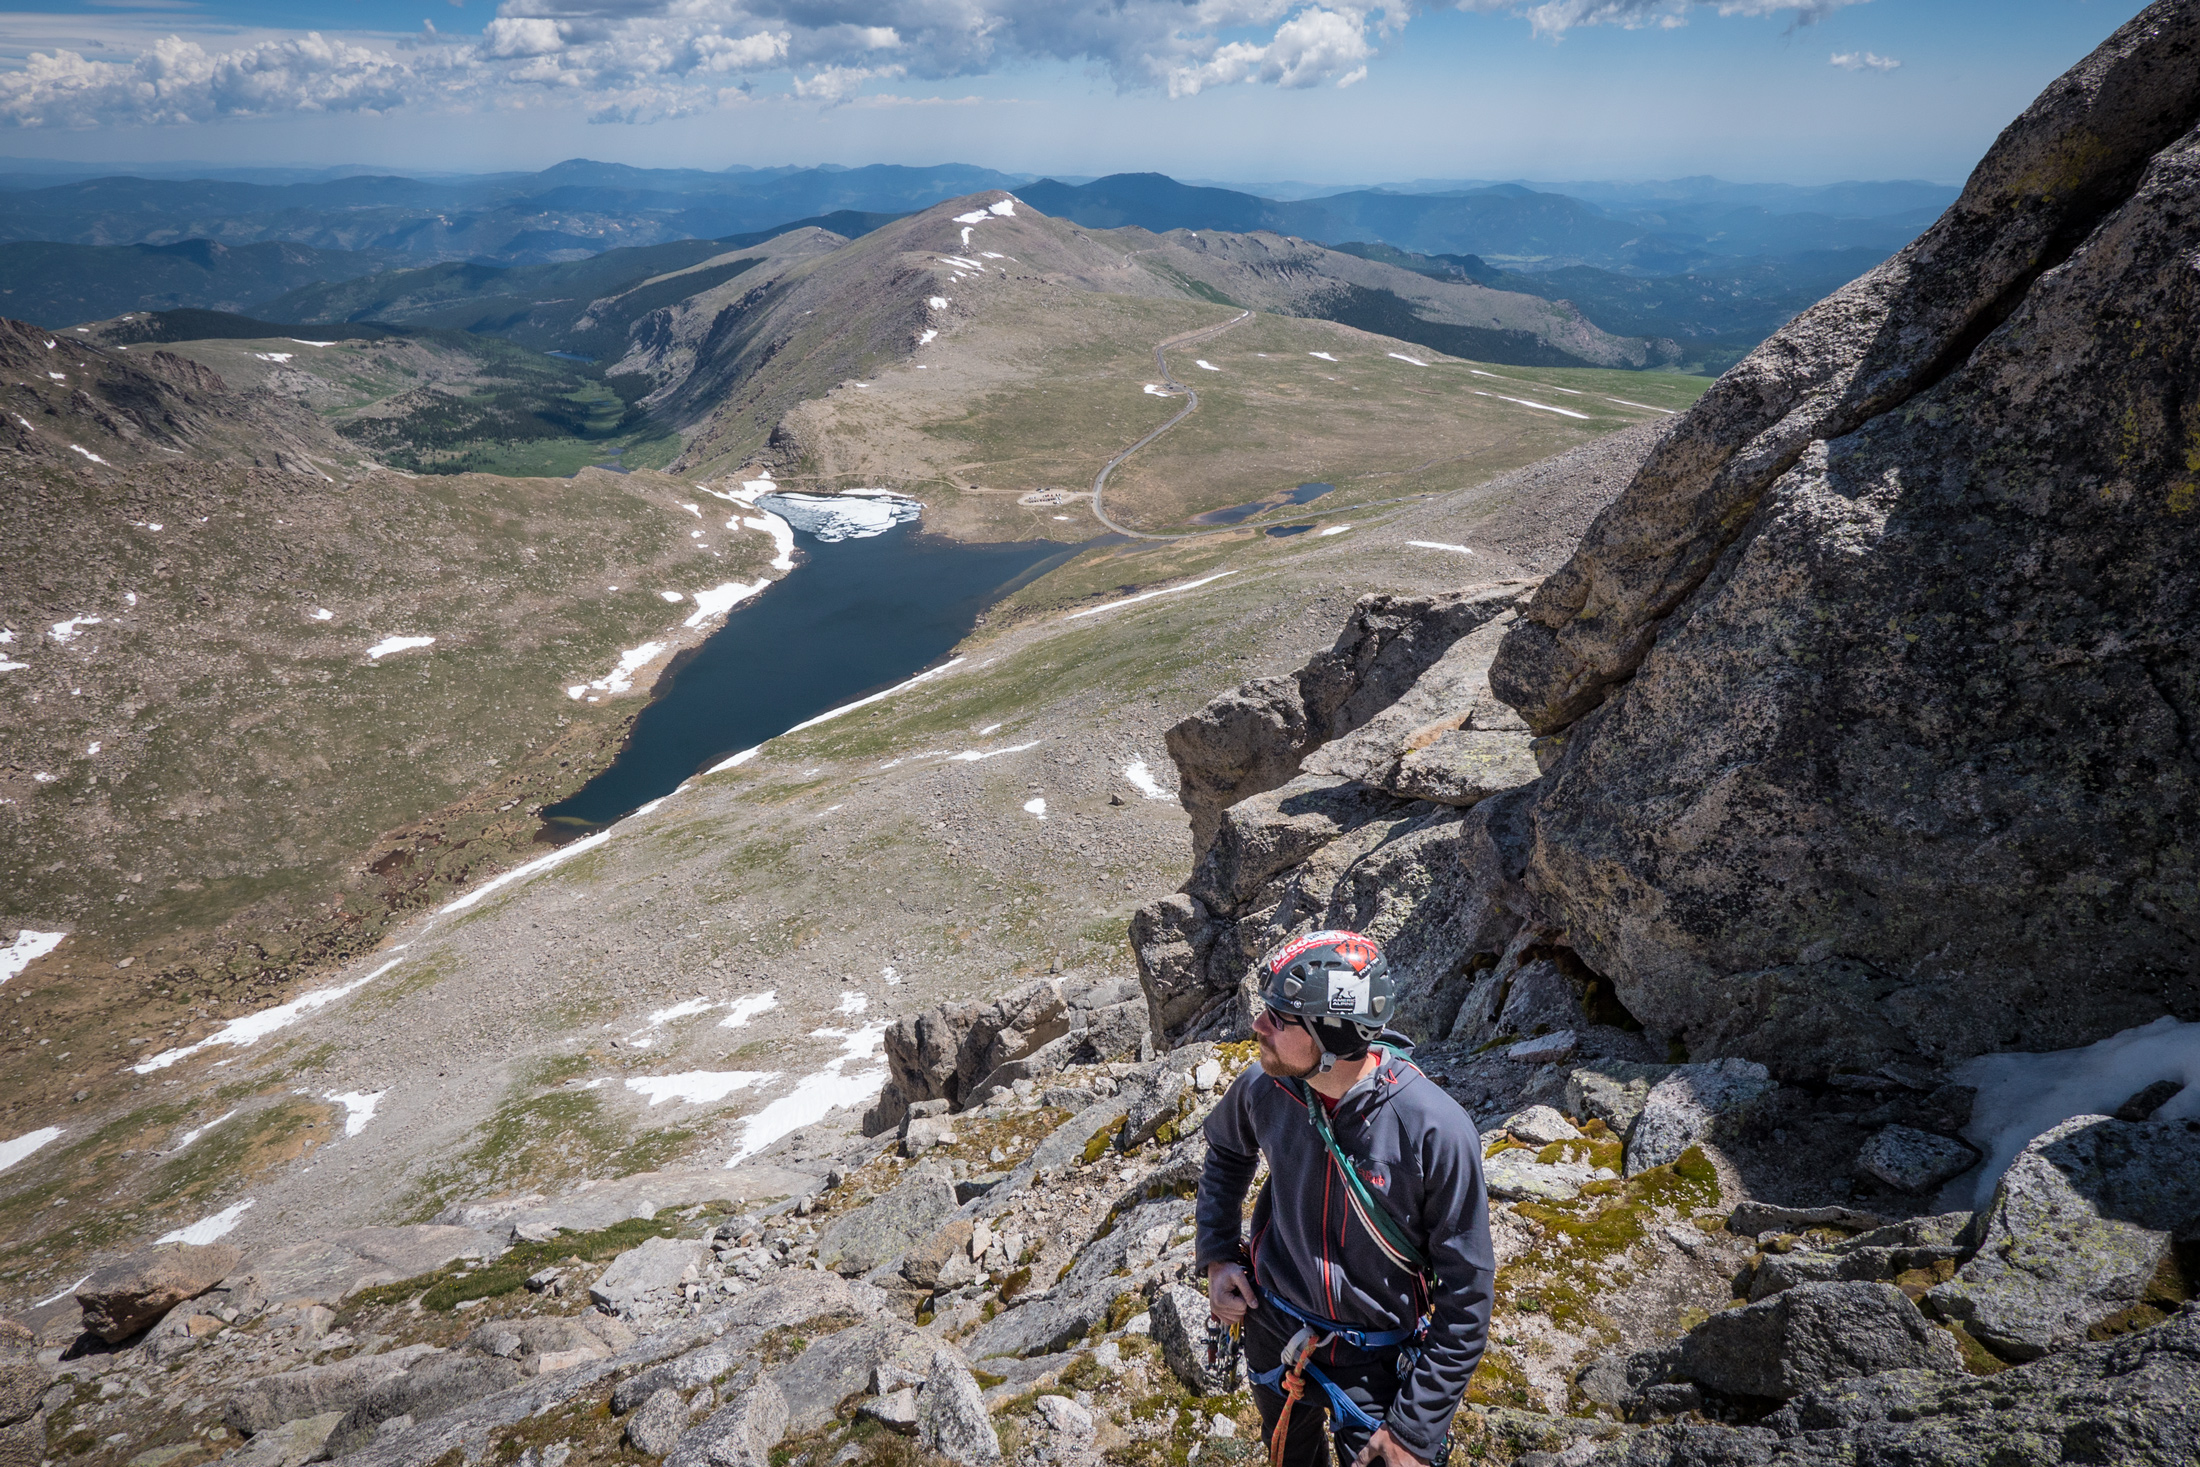 colorado-climbing-2017-1030493-web.jpg